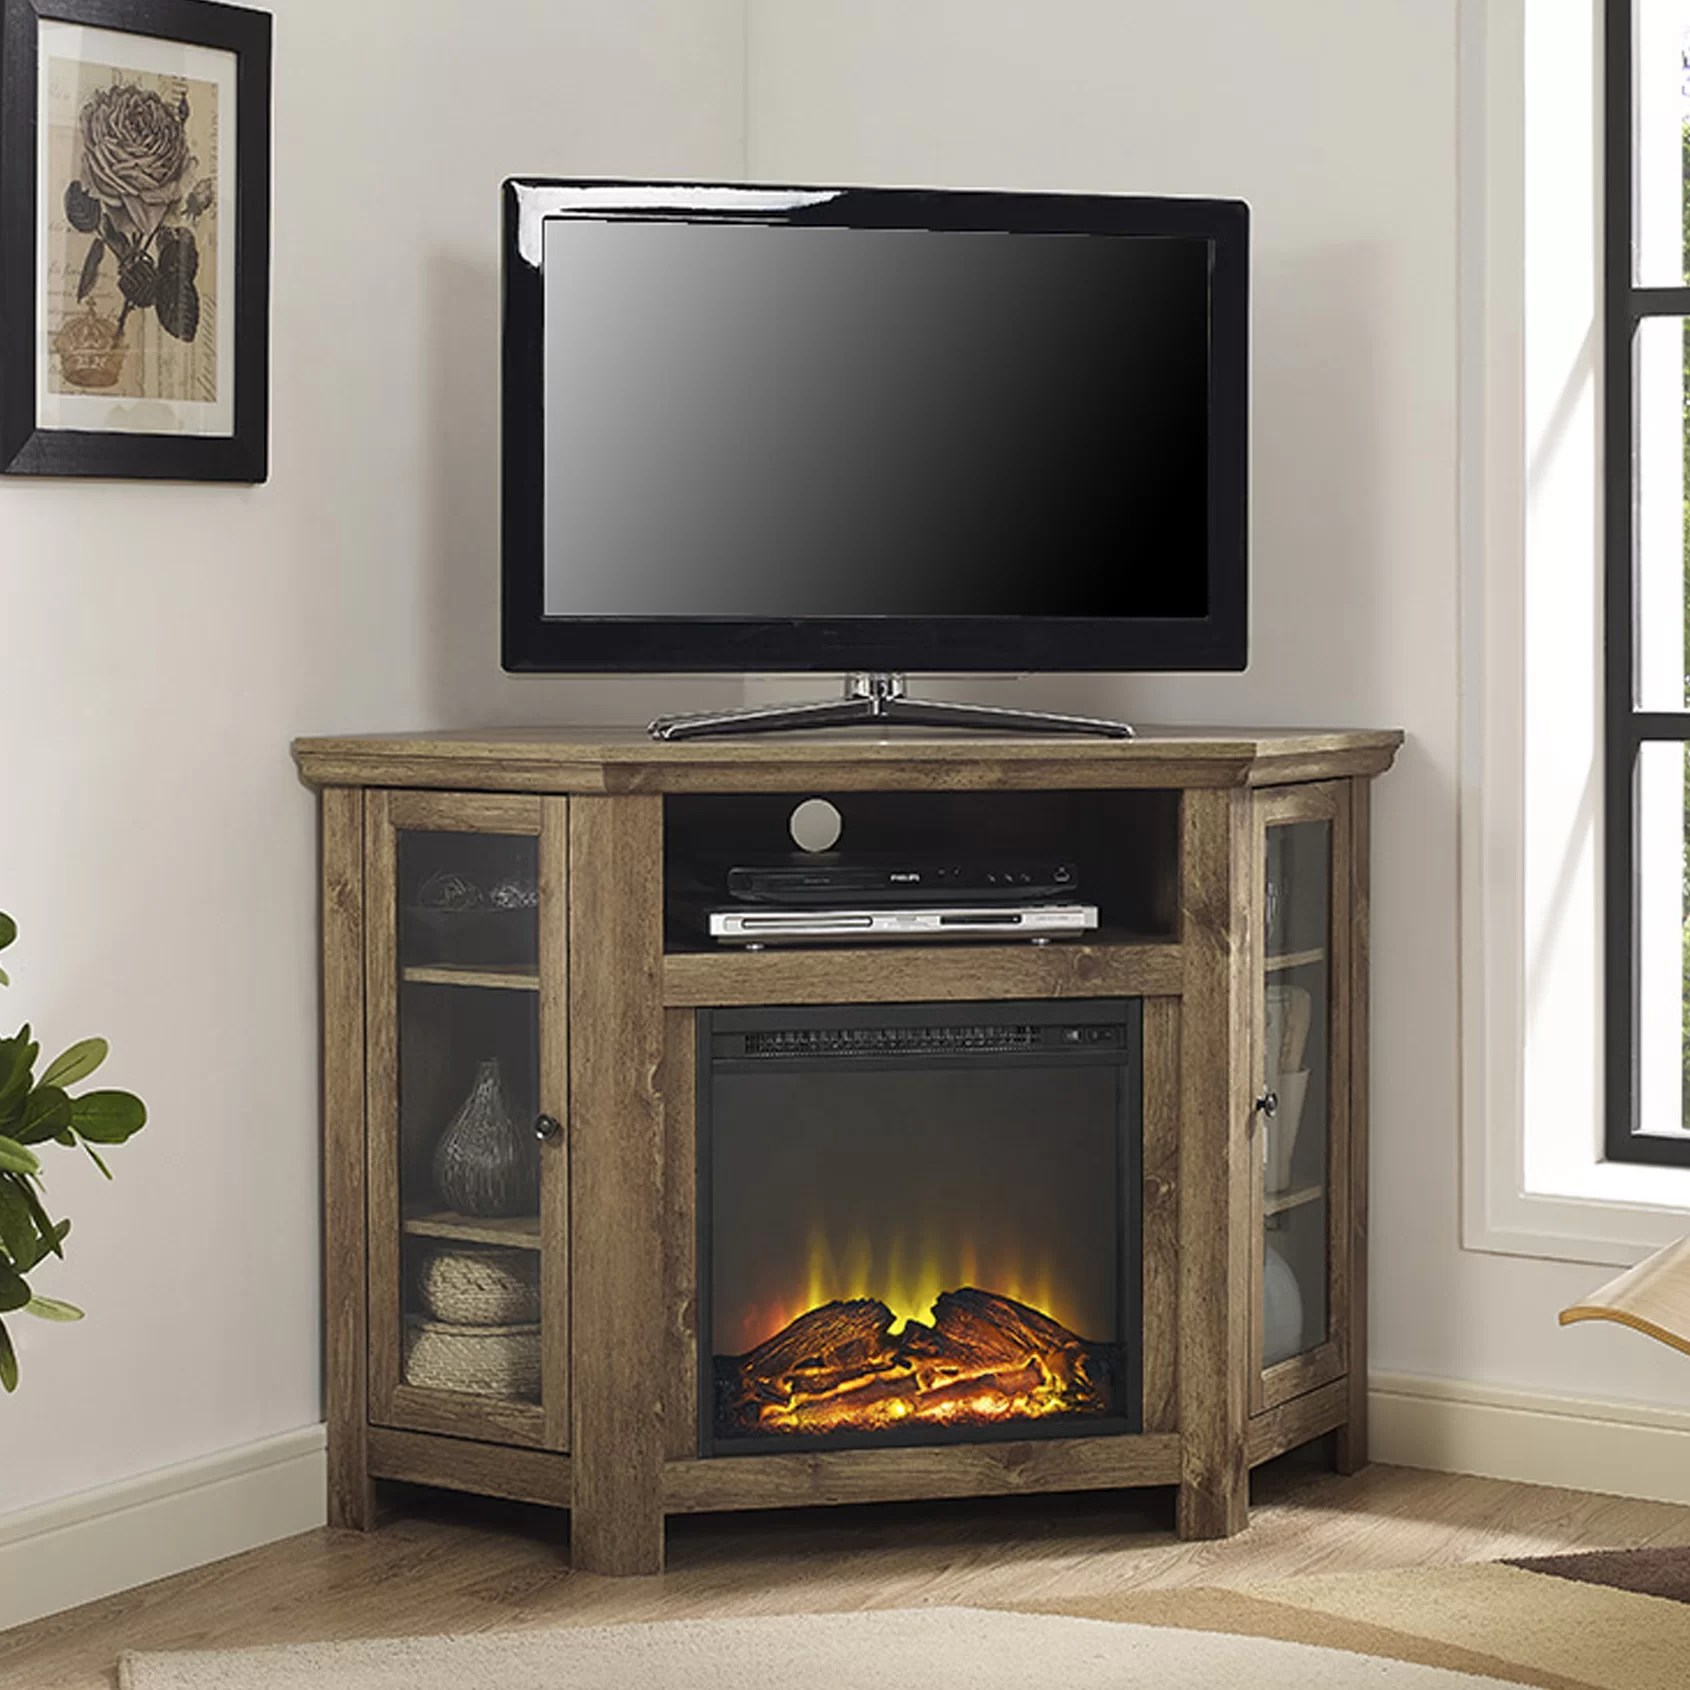 Loon Peak Pueblo Corner TV Stand with Electric Fireplace  Reviews  Wayfair